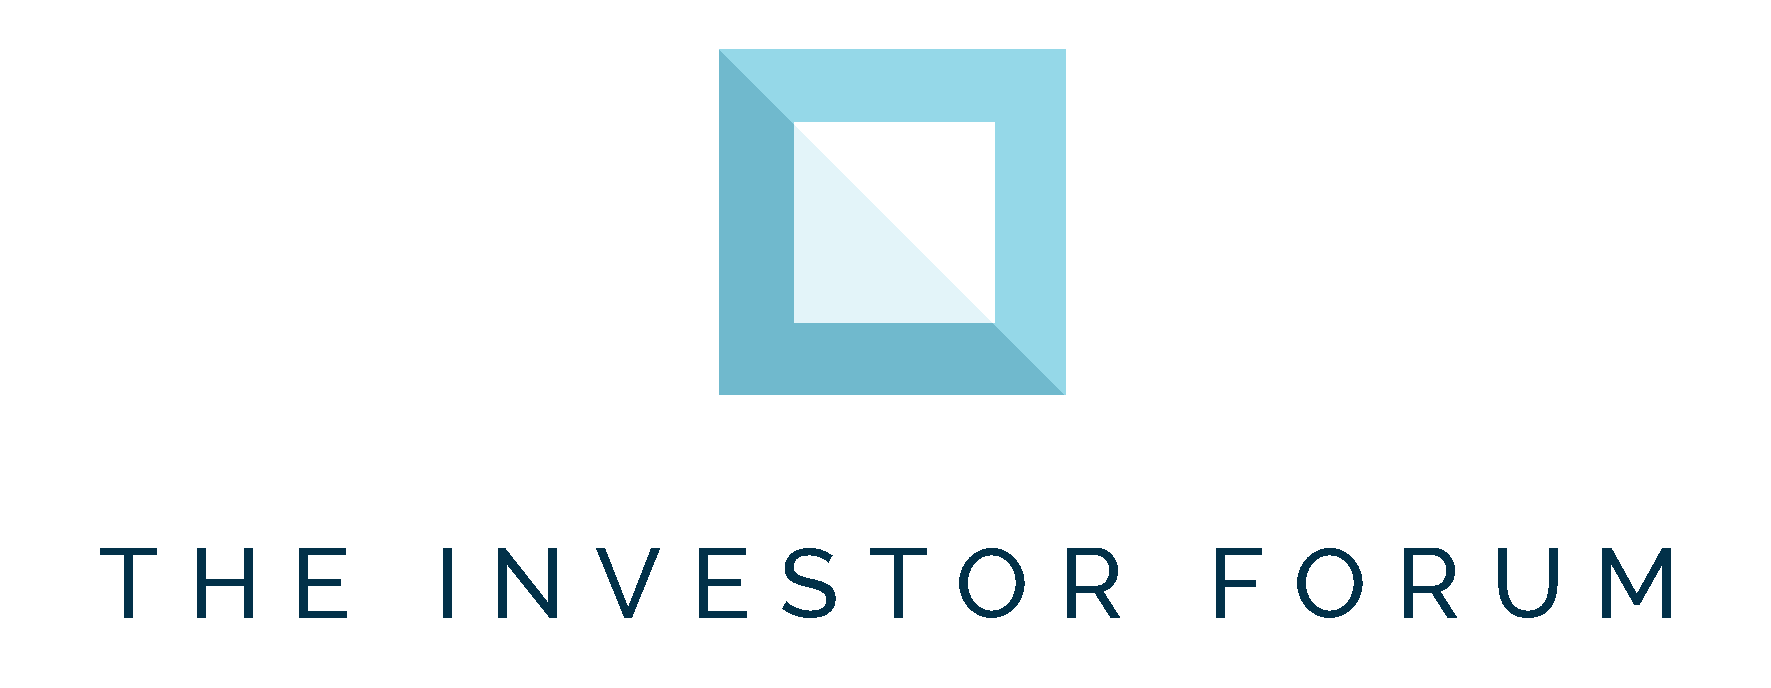 Investor Forum logo